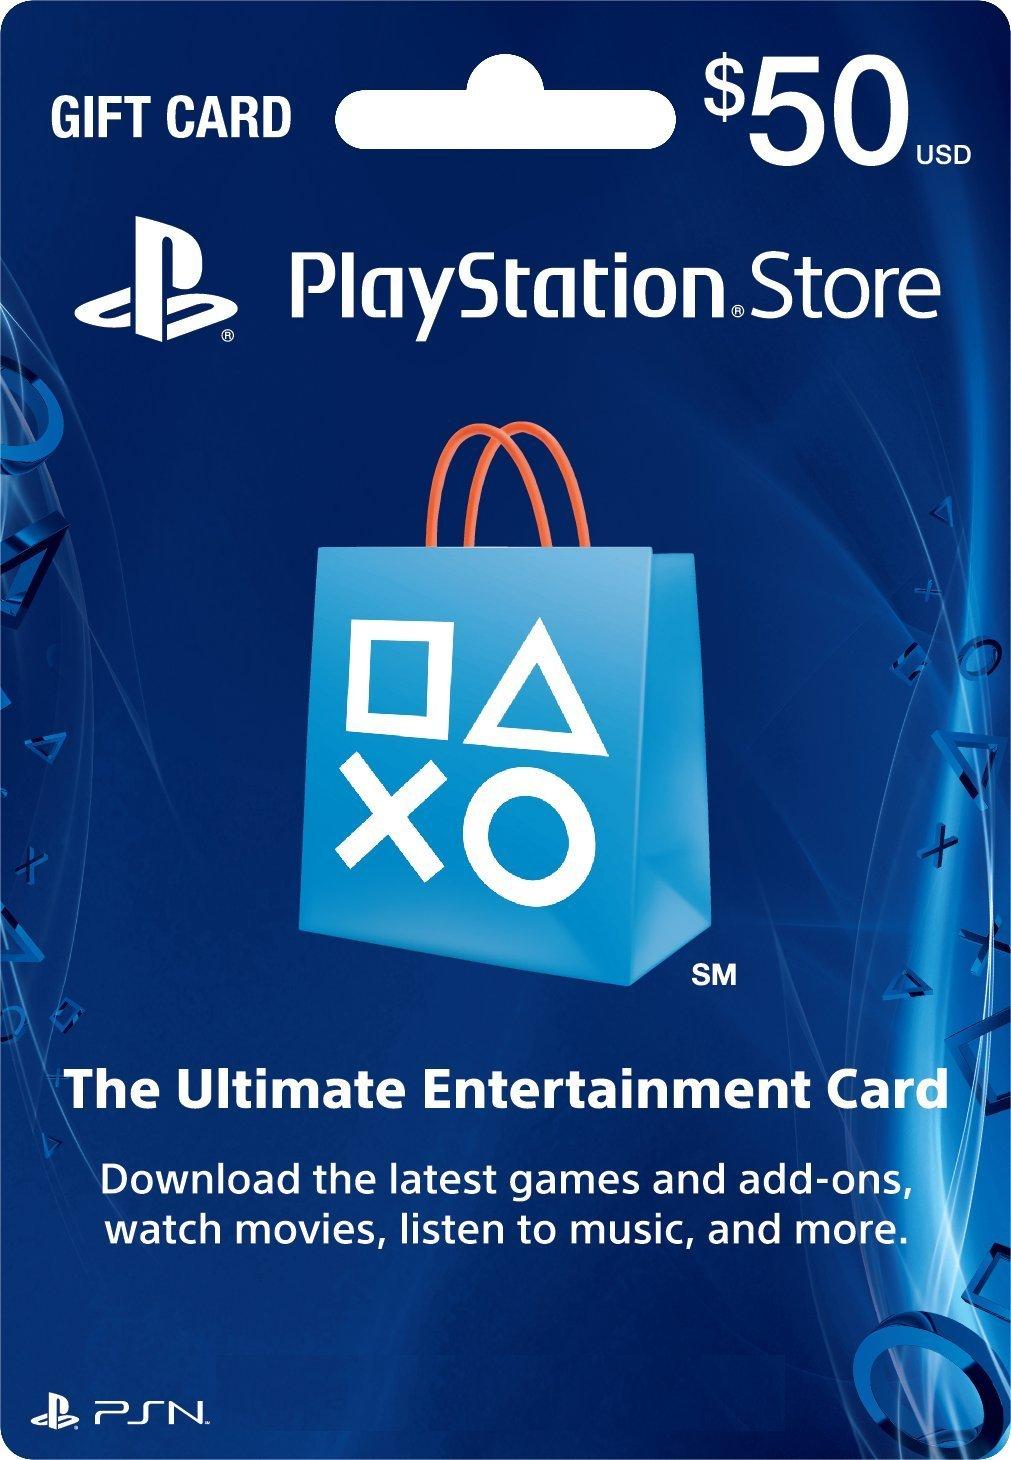 Buy PSN Gift Card Code USA $50 for the PS4, PS3, PS Vita